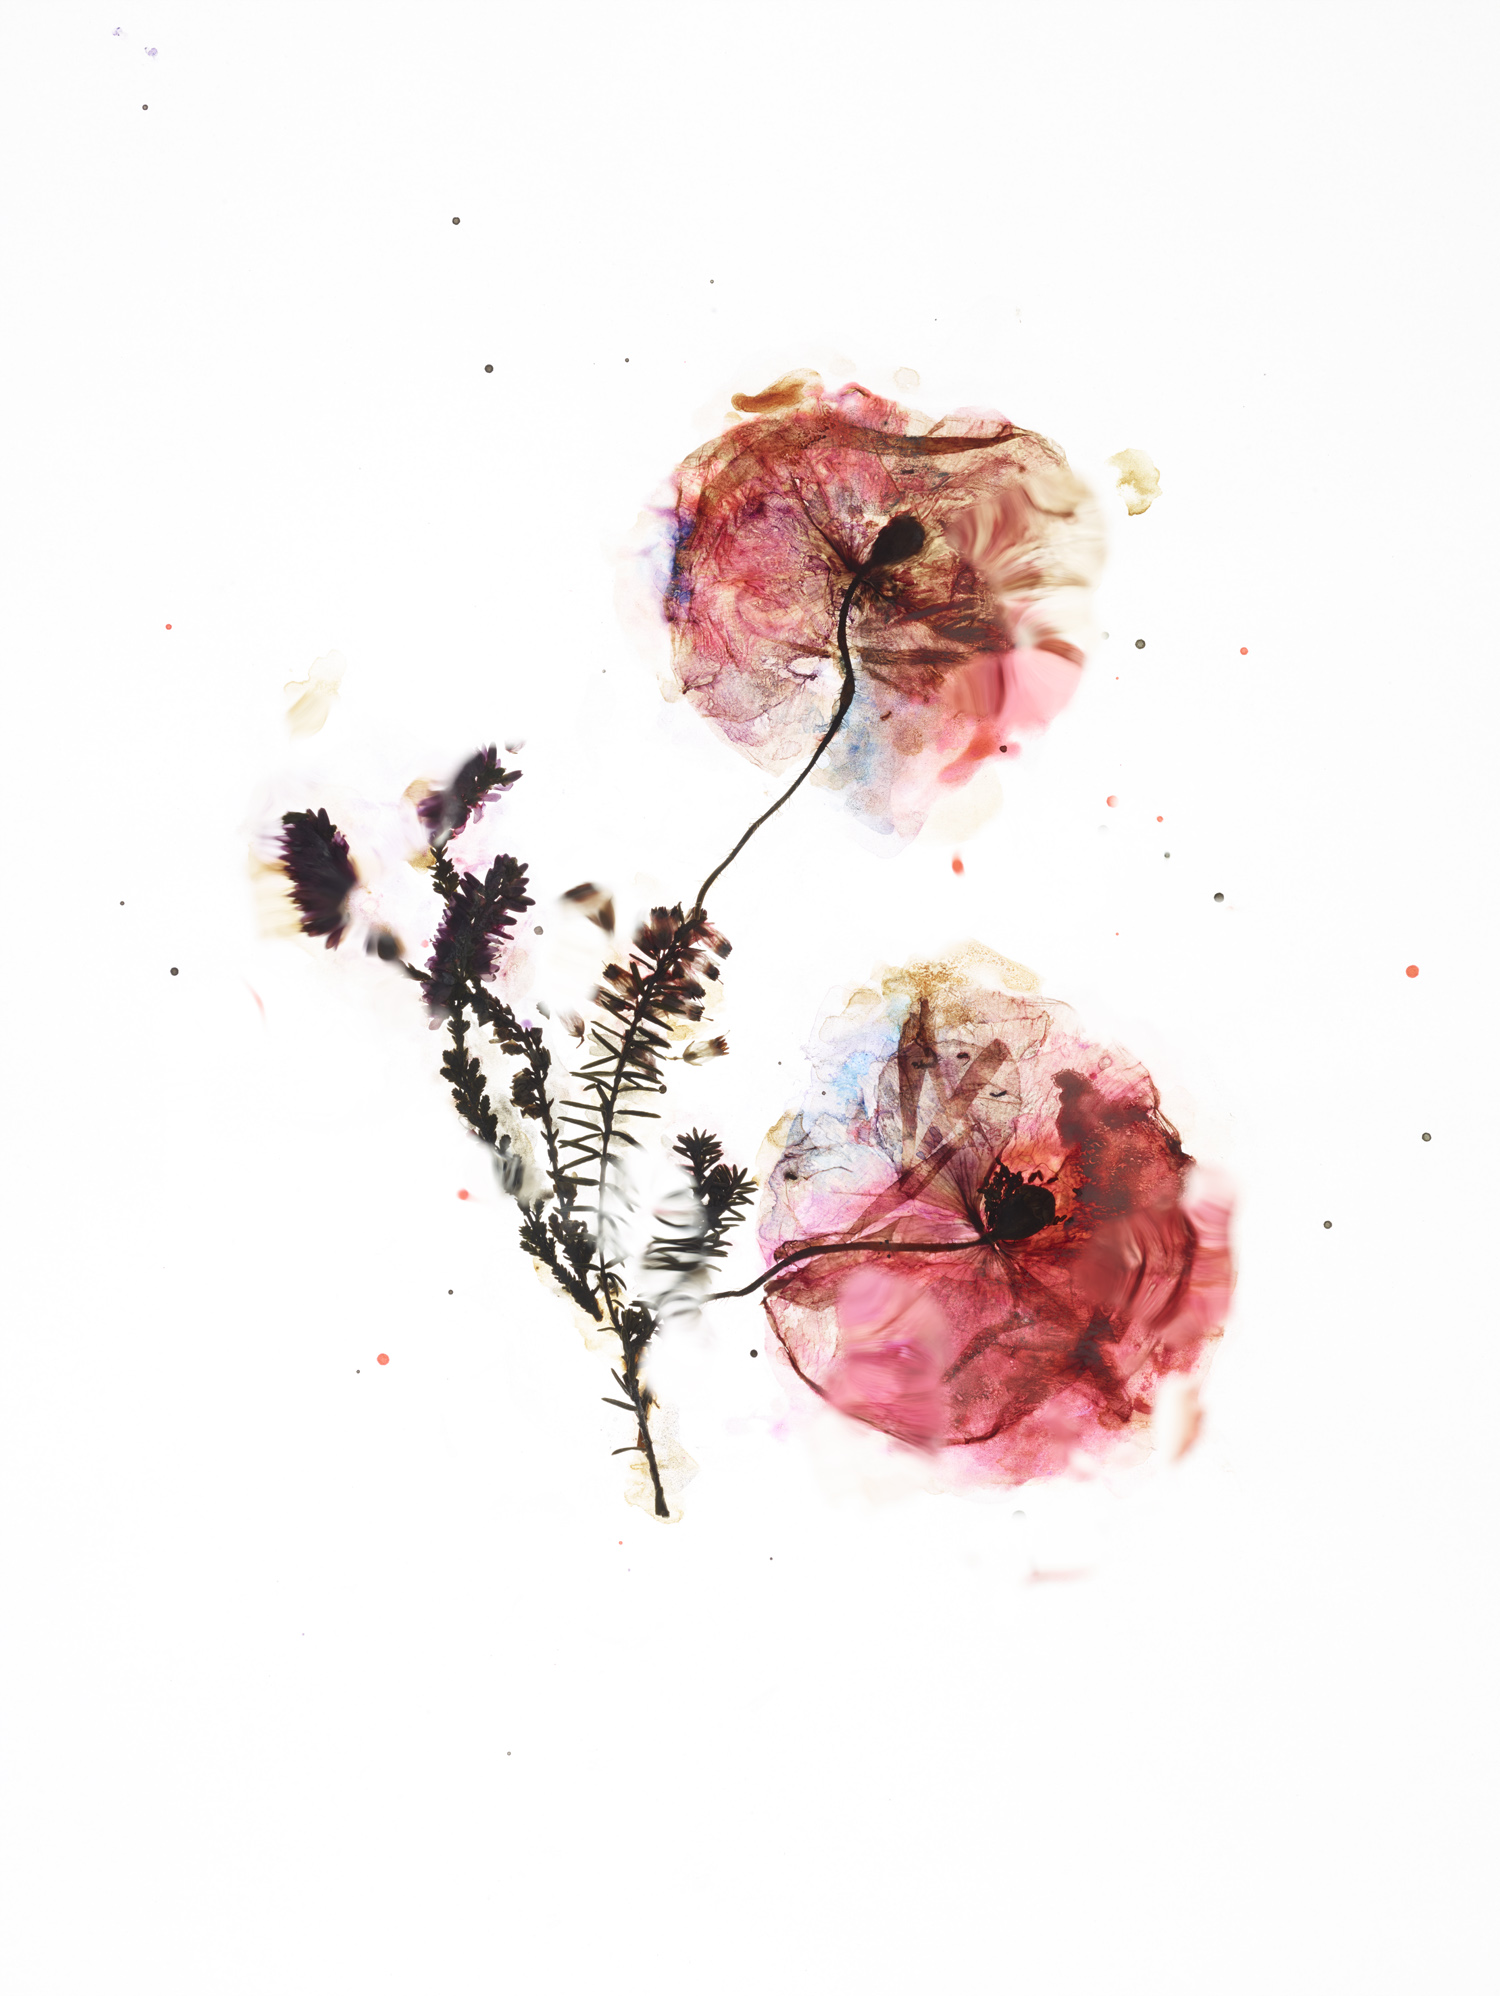 rf4201_dried_flower_test_s02_065